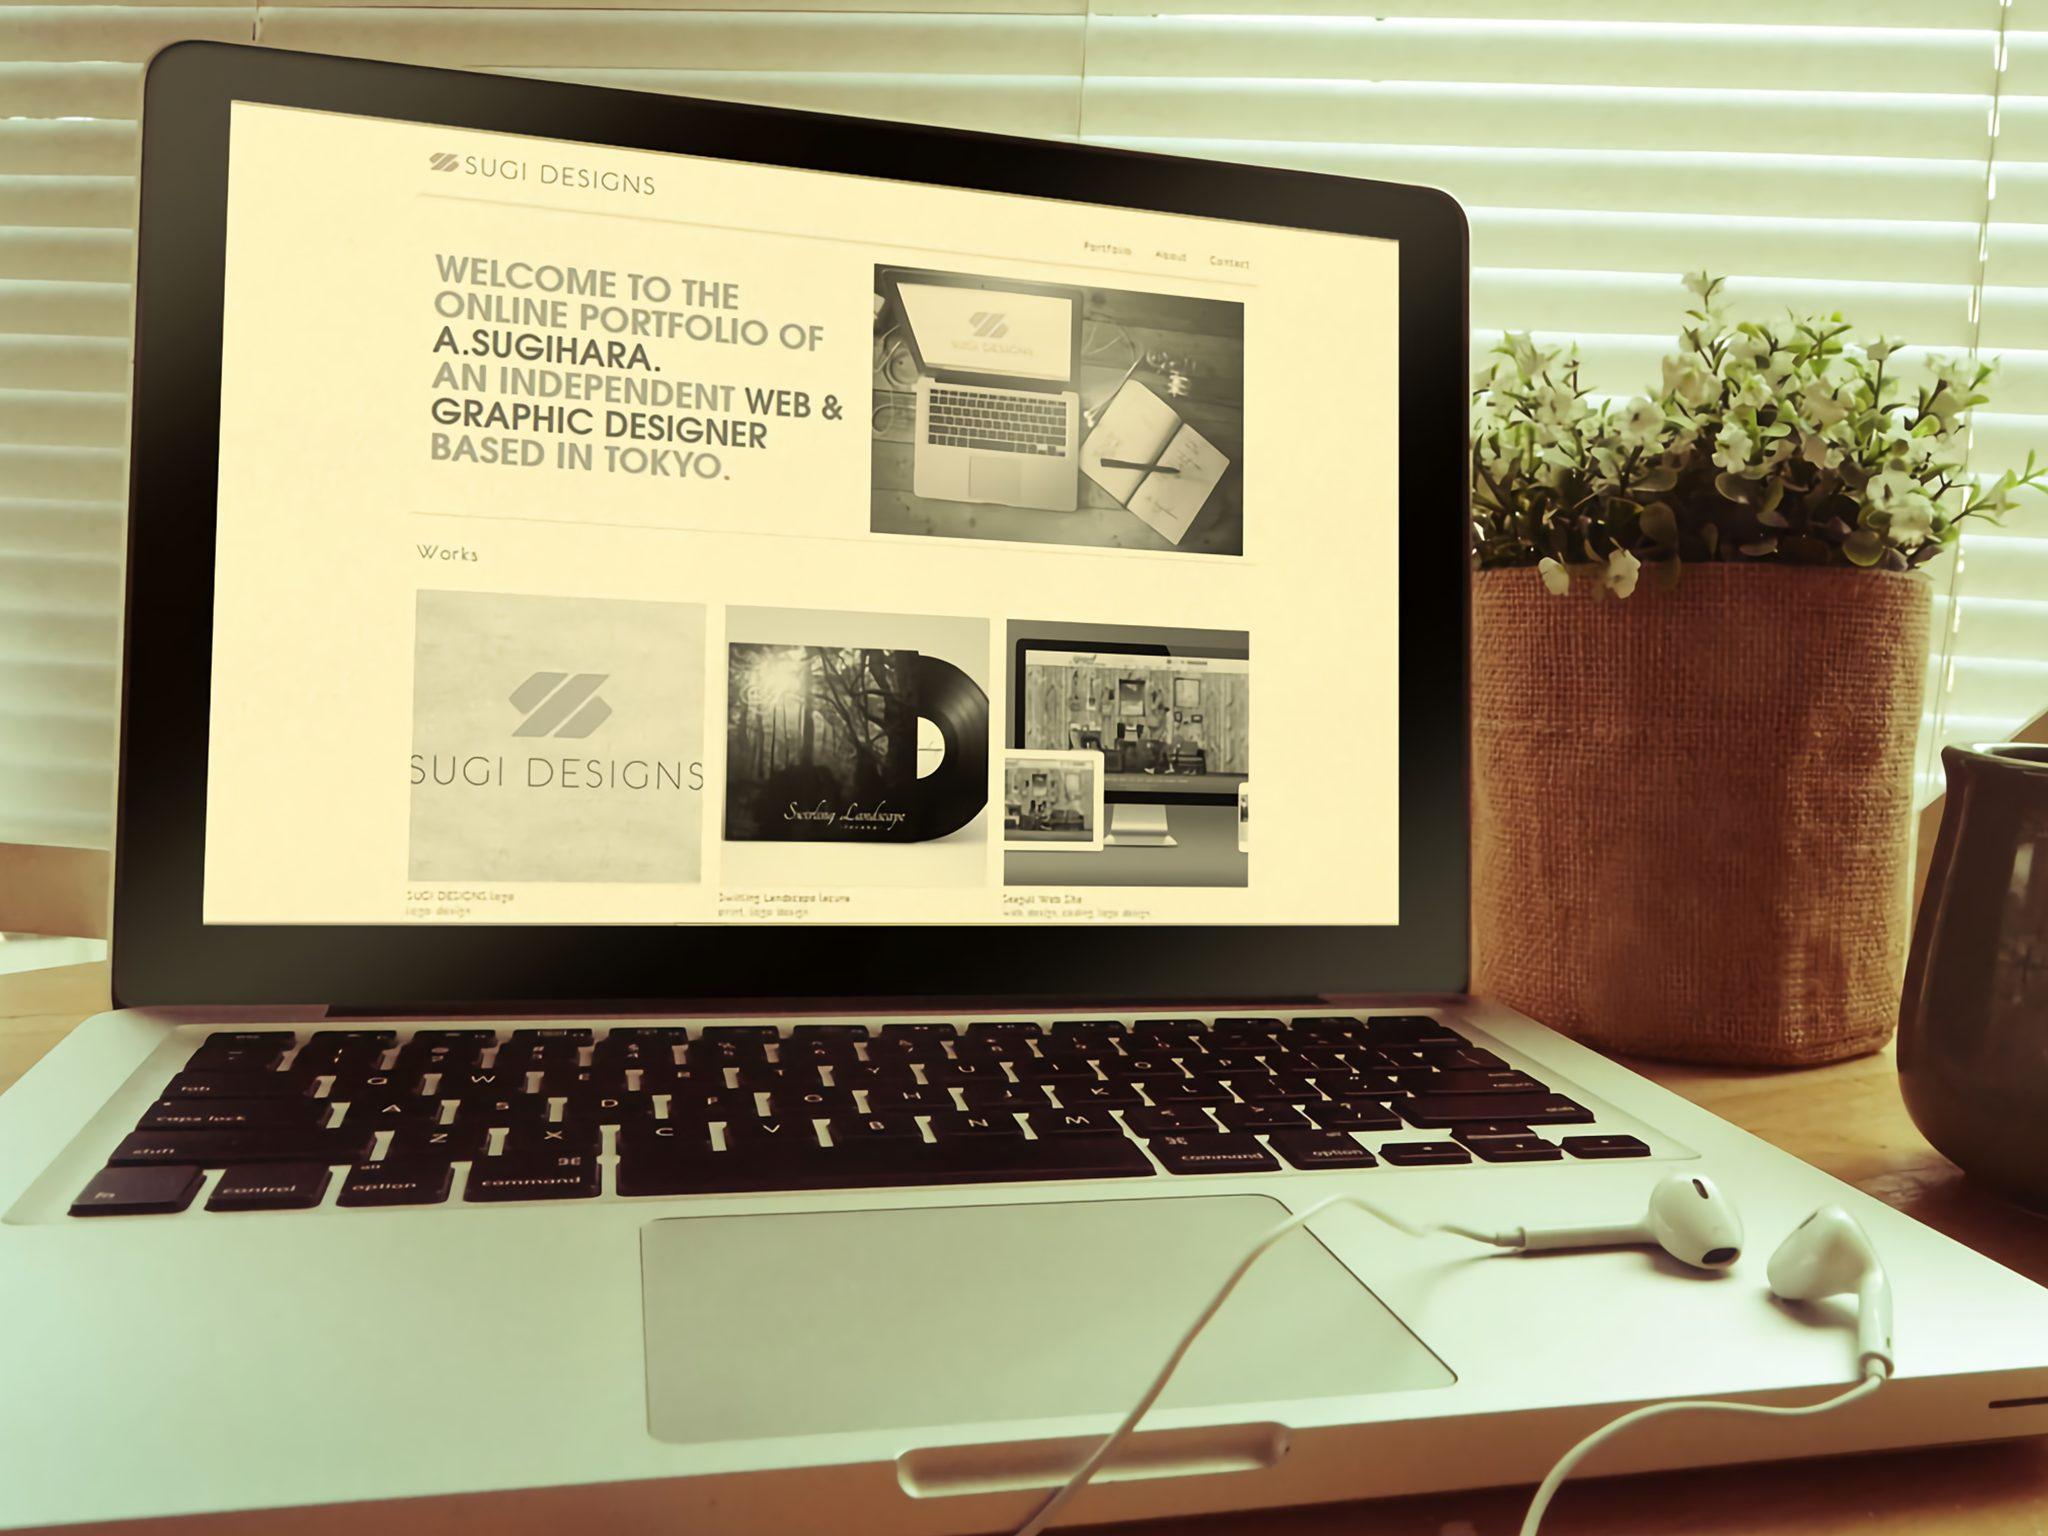 SUGI DESIGNS WEB SITE